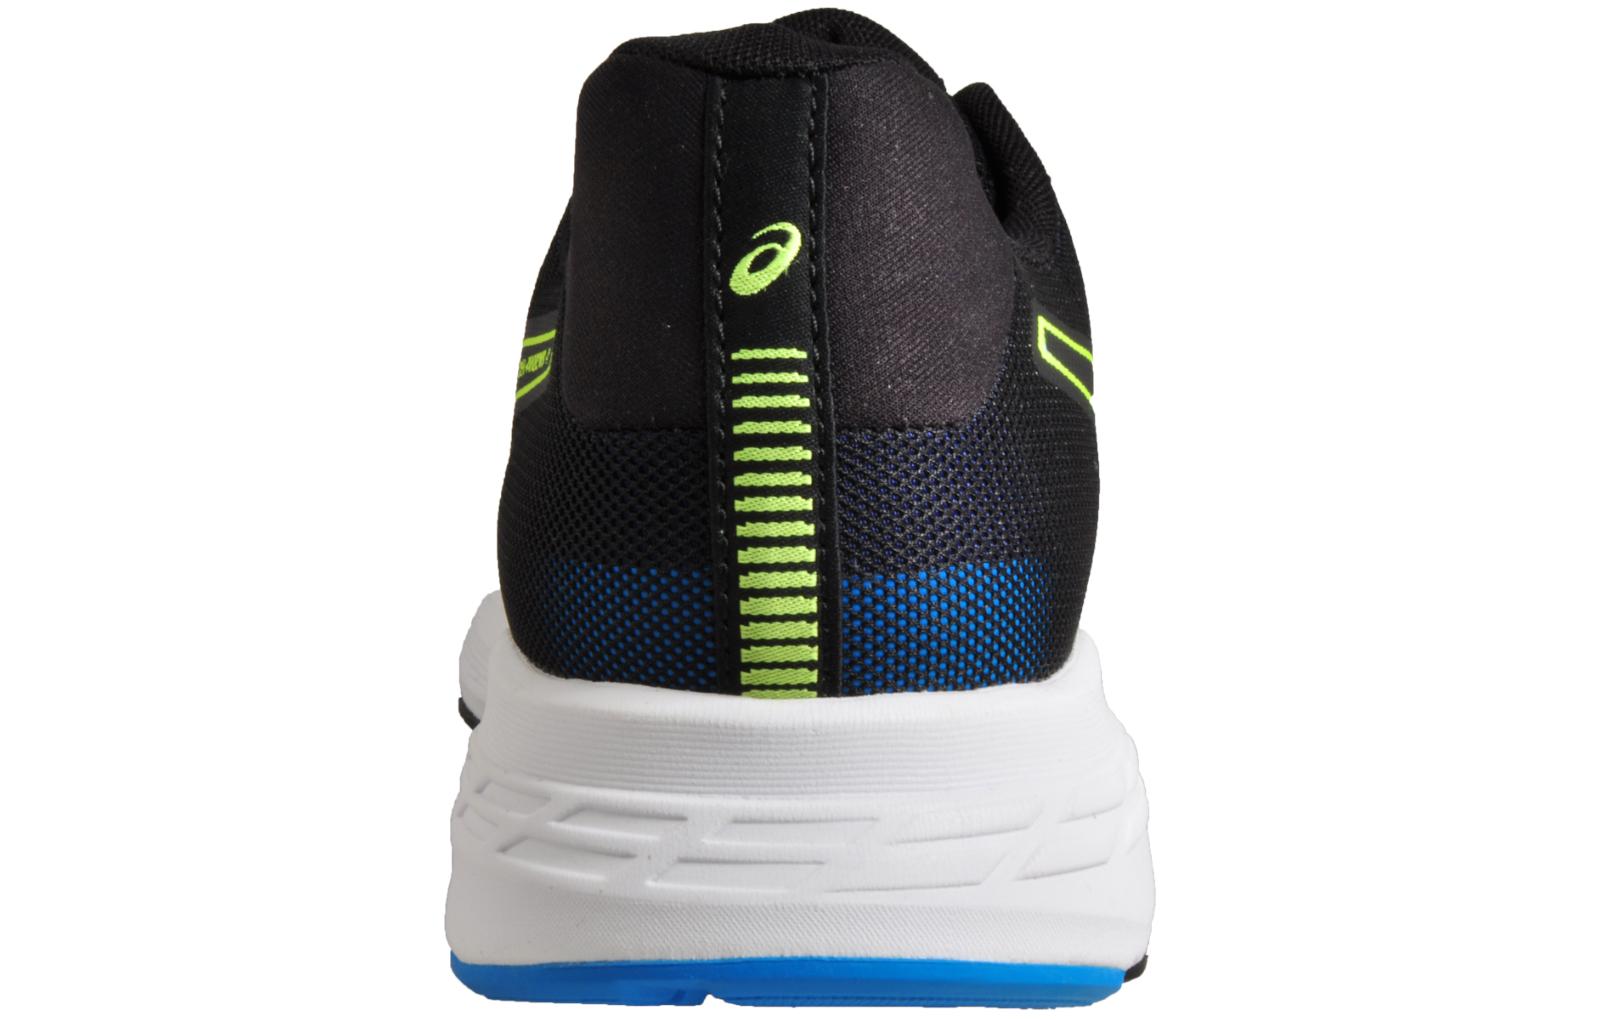 eb6b6947718 Asics Gel Phoenix 9 Men s Premium Running Shoes Gym Fitness Trainers Dark  Blue